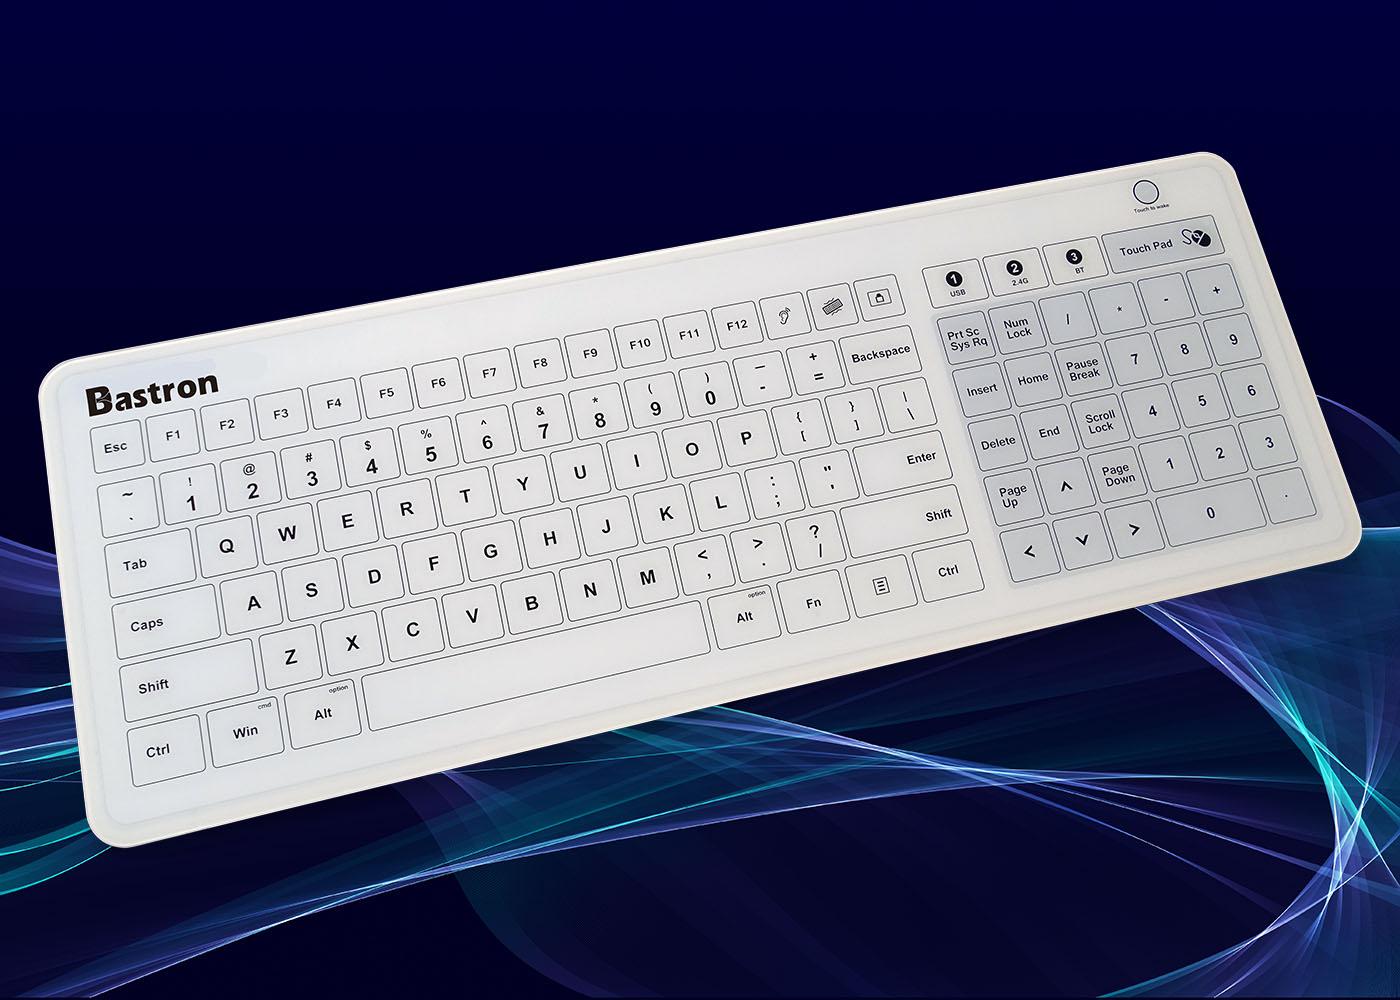 B45 : clavier verre étanche, USB, RF 2,4 Ghz, Bluetooth®